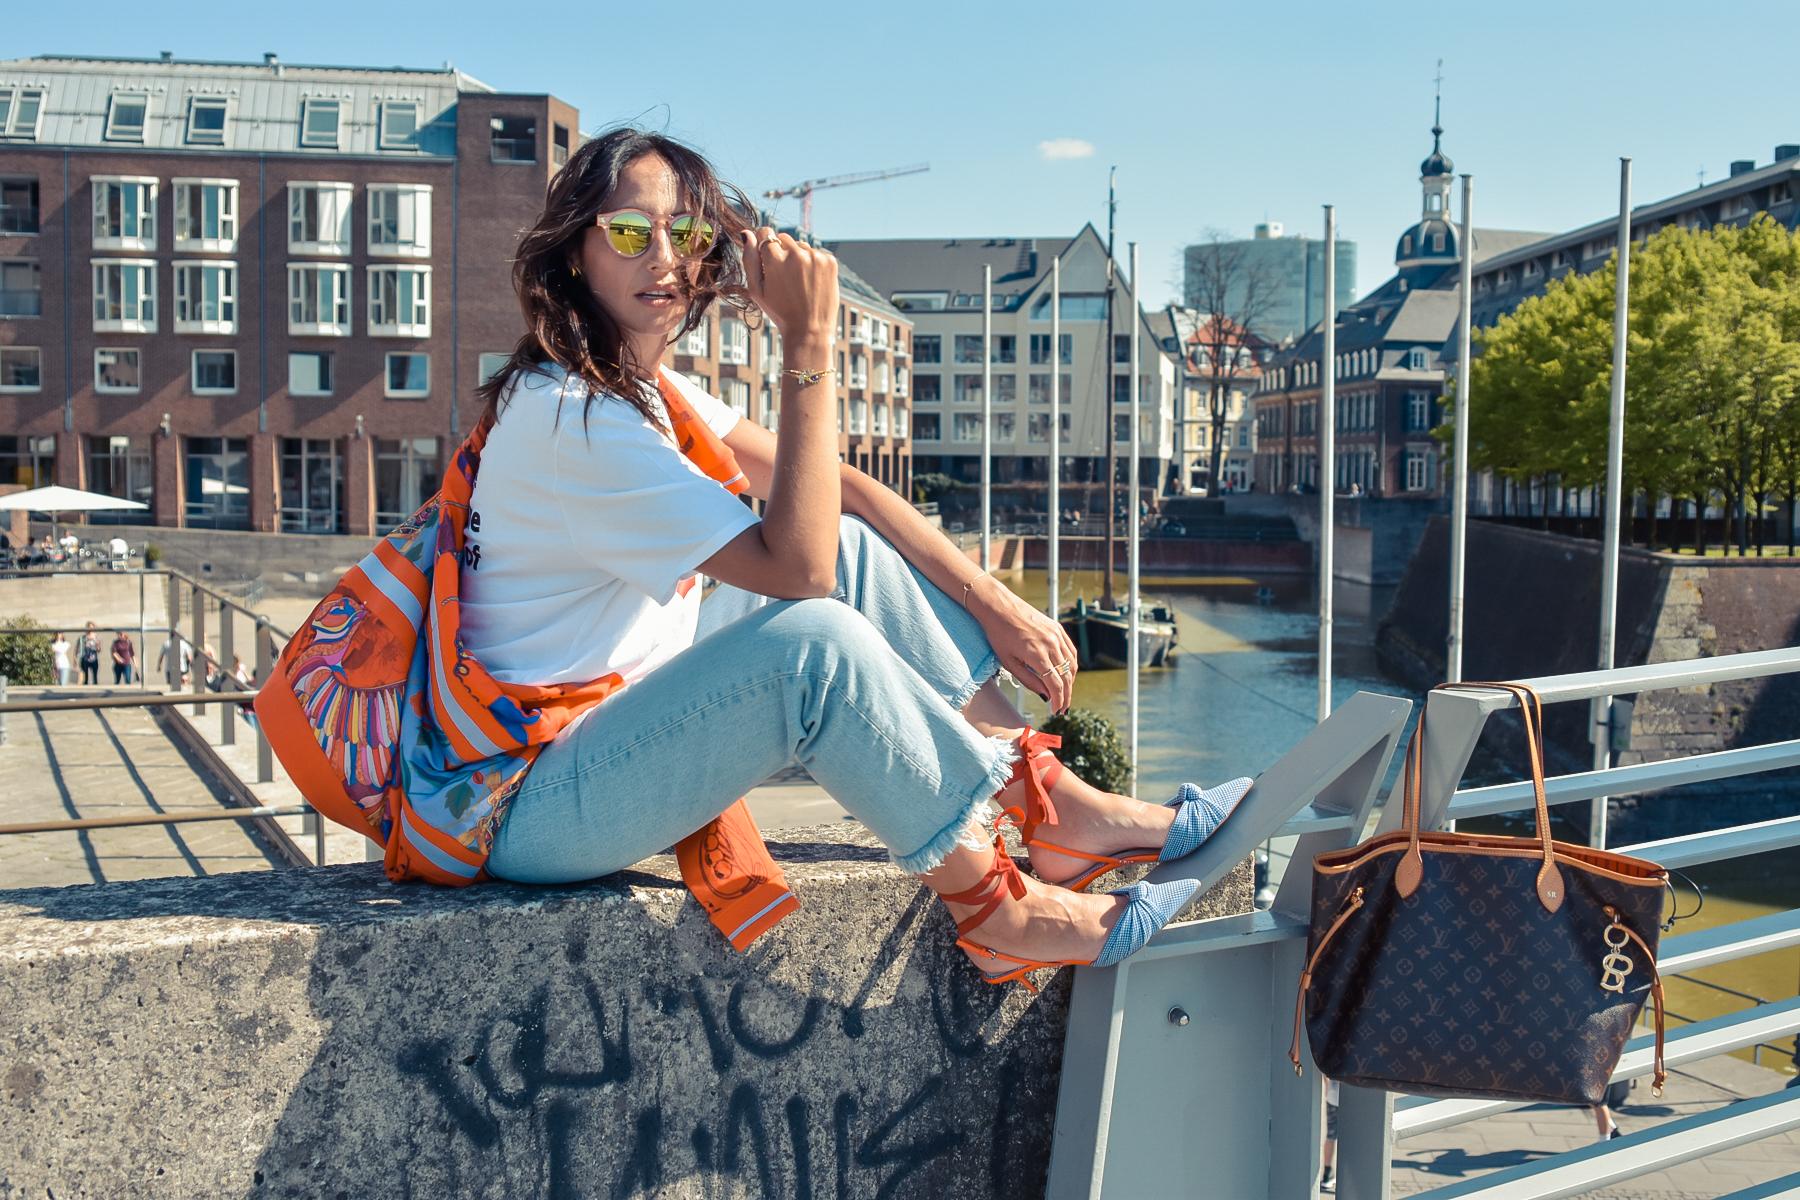 el-blog-de-silvia-viajar-dusseldorf-jersey-geometrico-jeans-levis-02